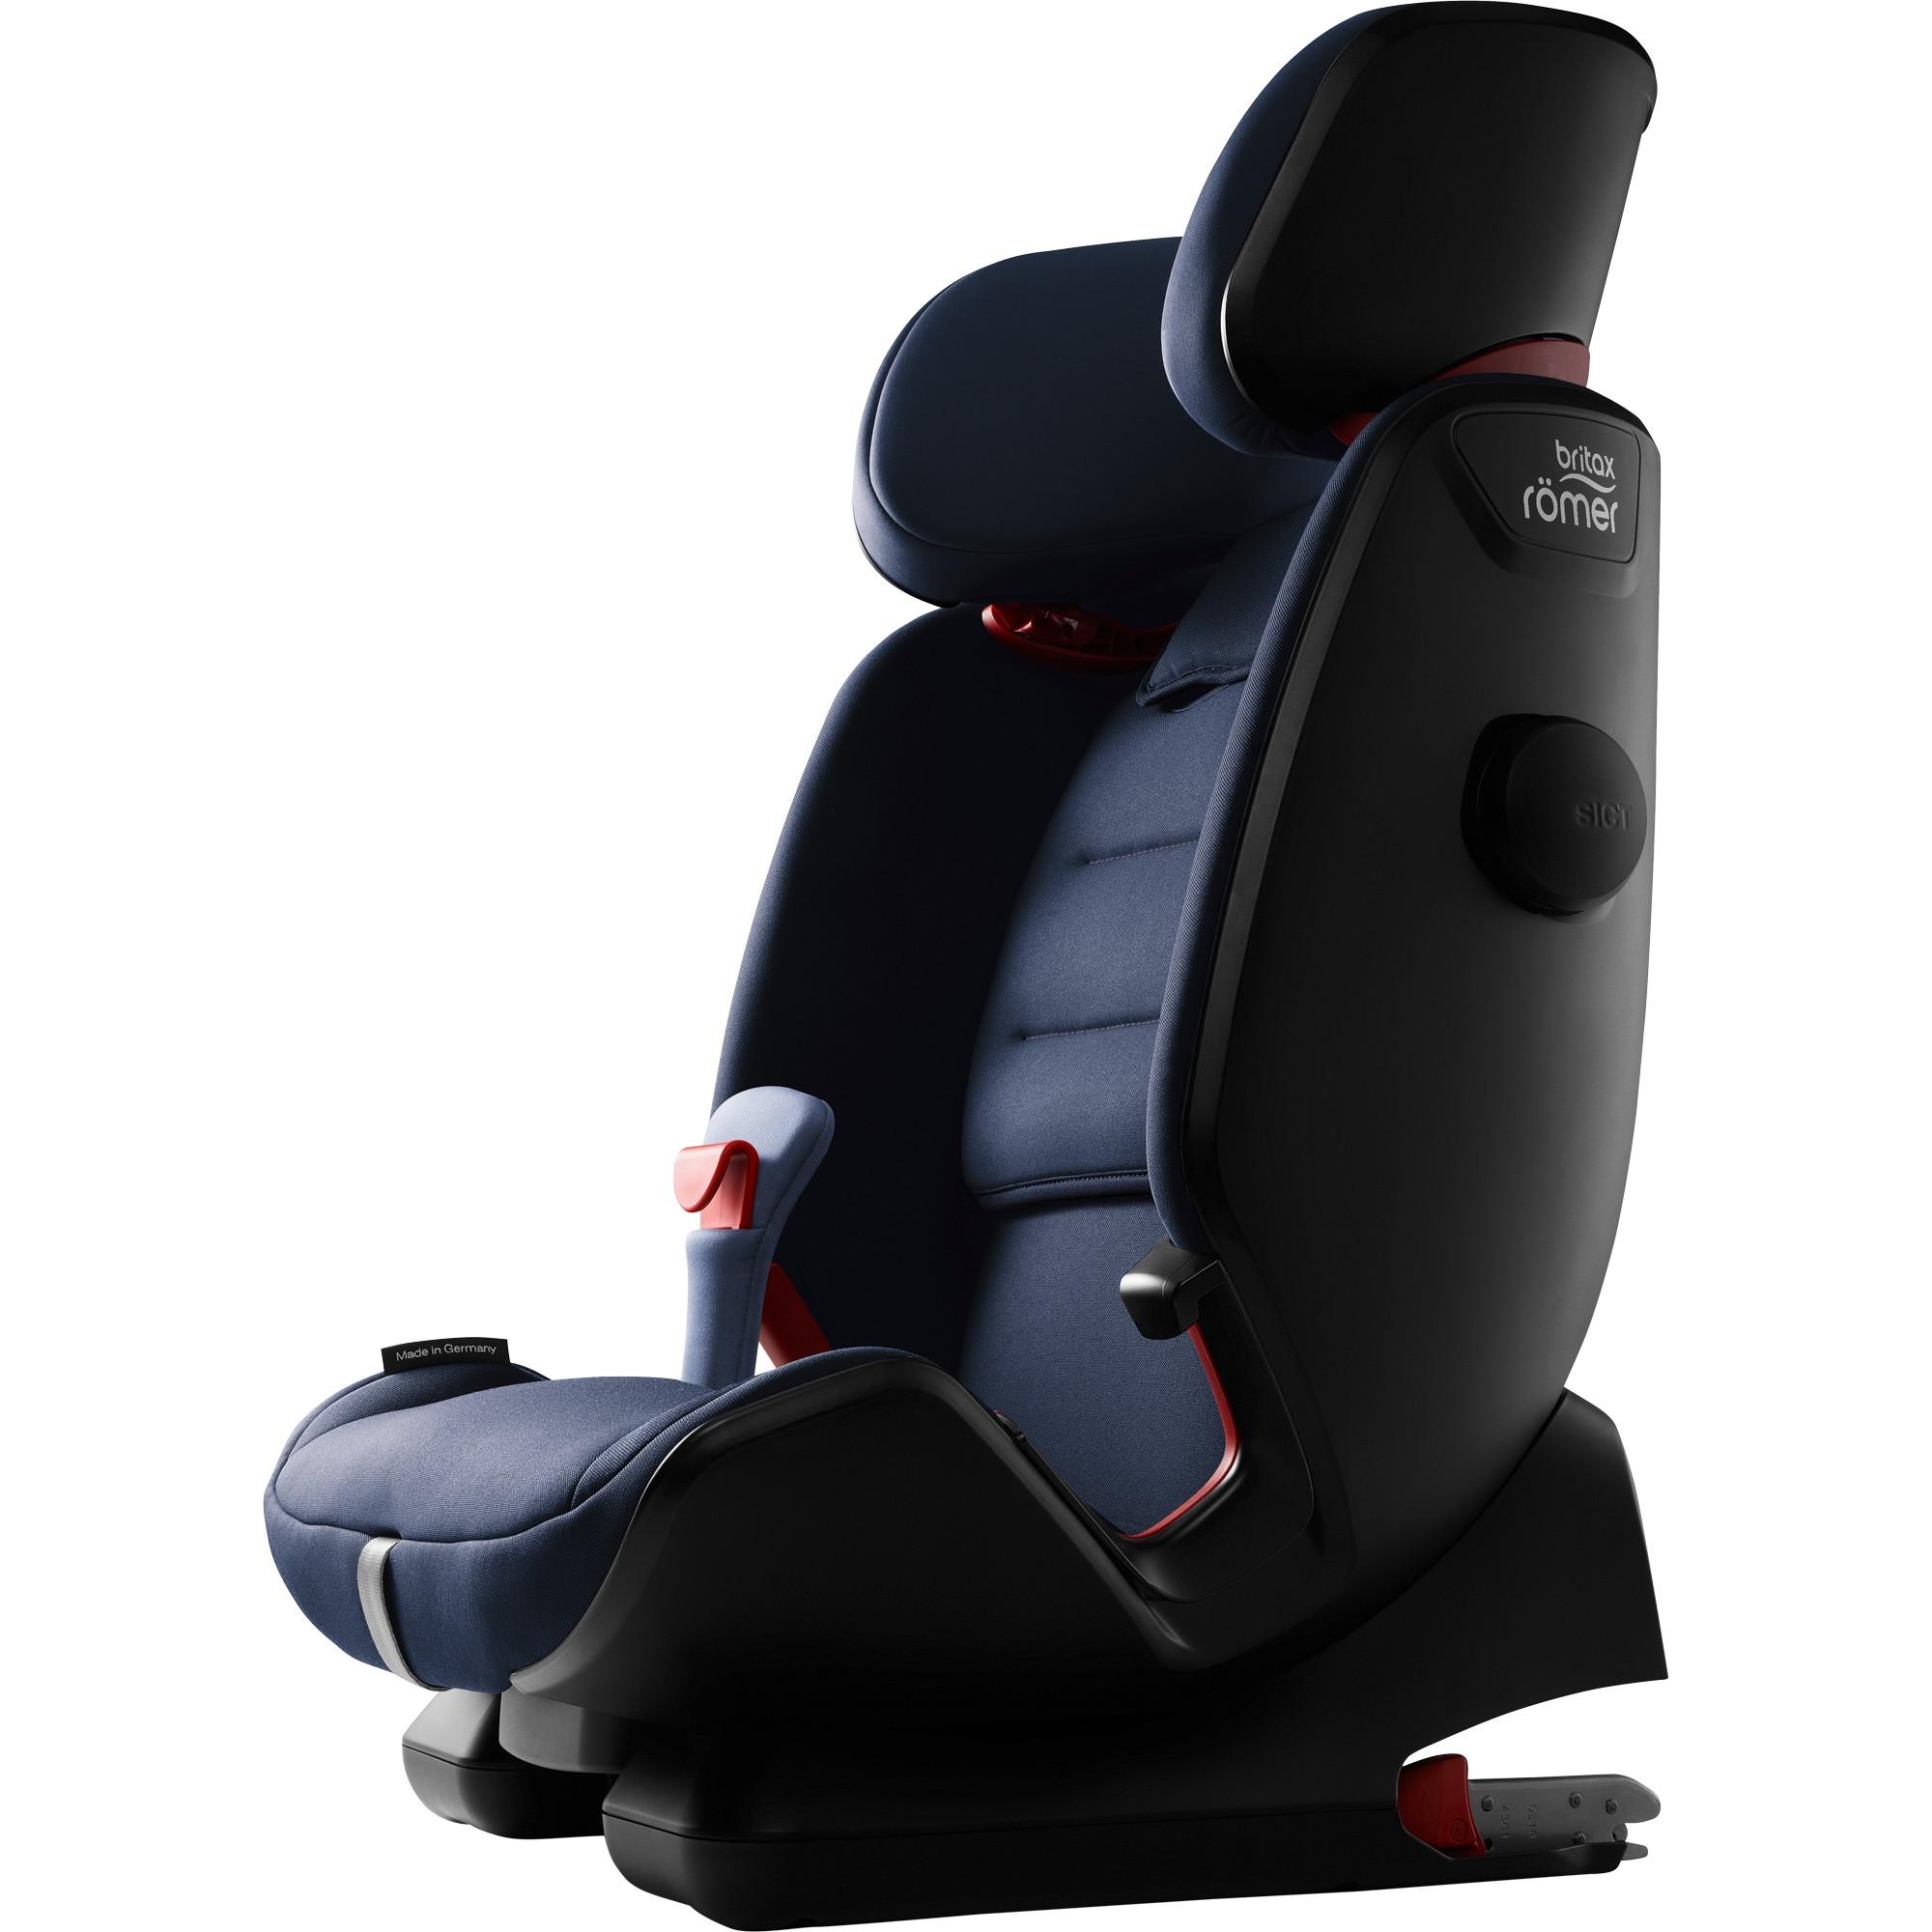 Britax-Romer-ADVANSAFIX-IV-R-Group-1-2-3-Child-Car-Seat thumbnail 10